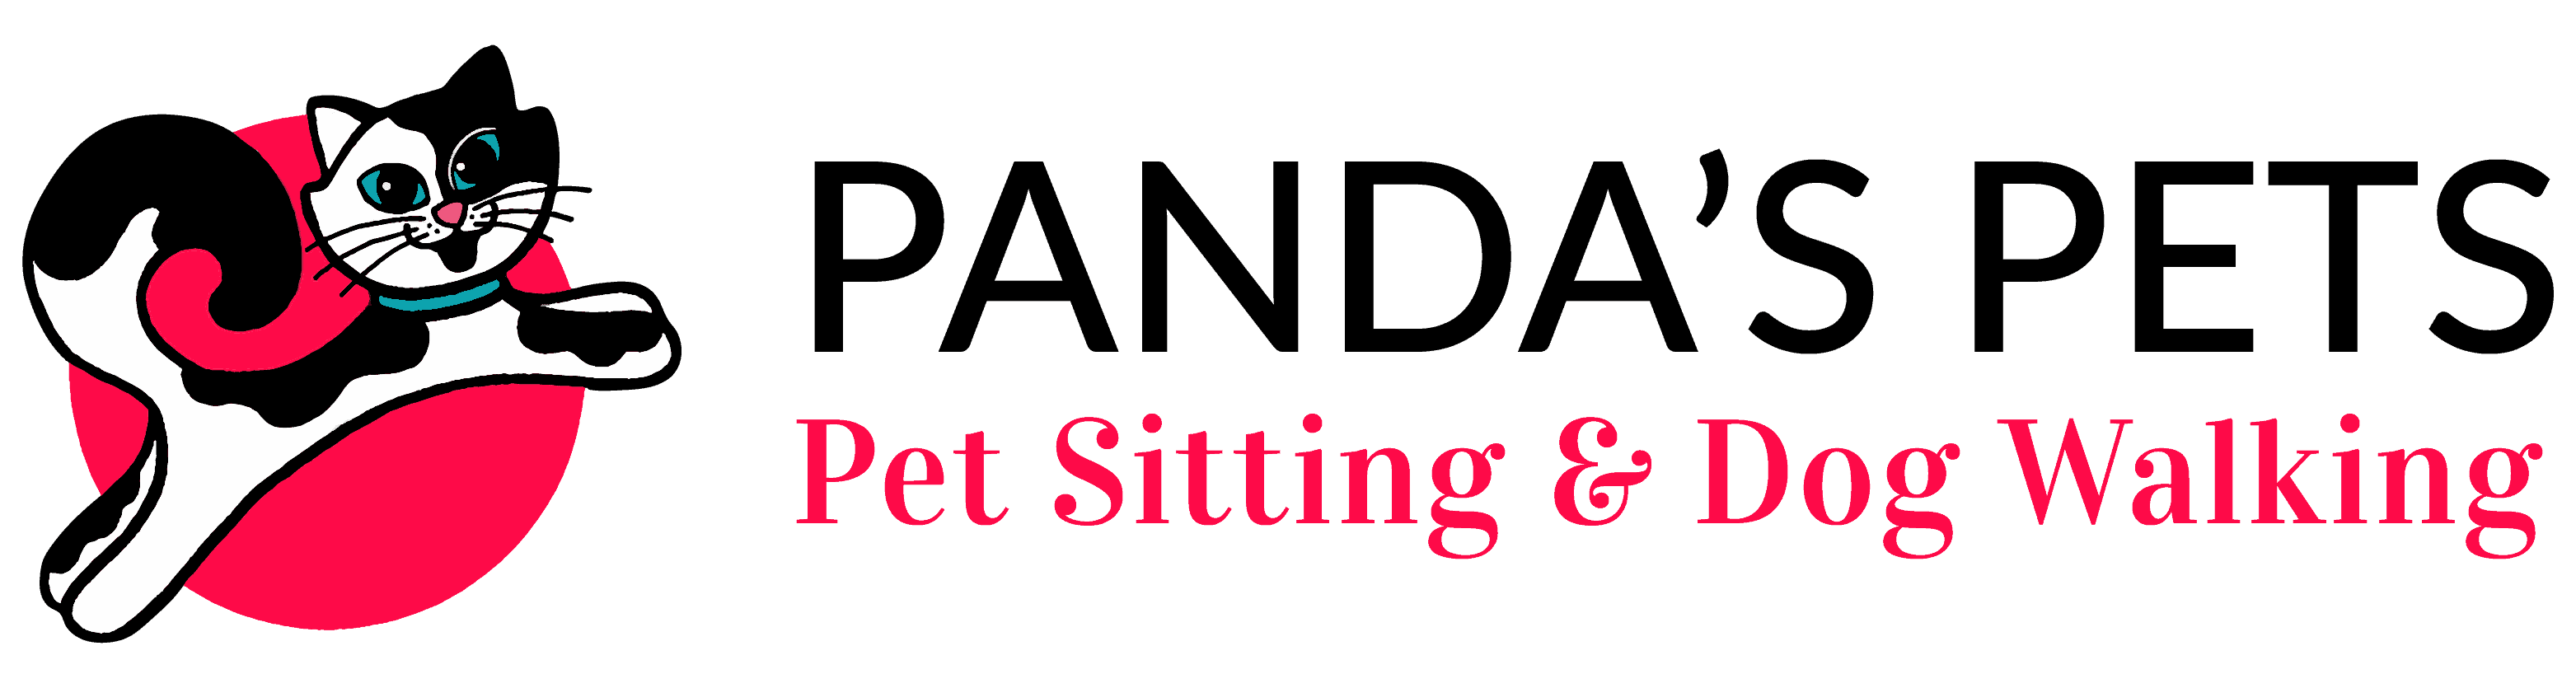 Pandas Pets